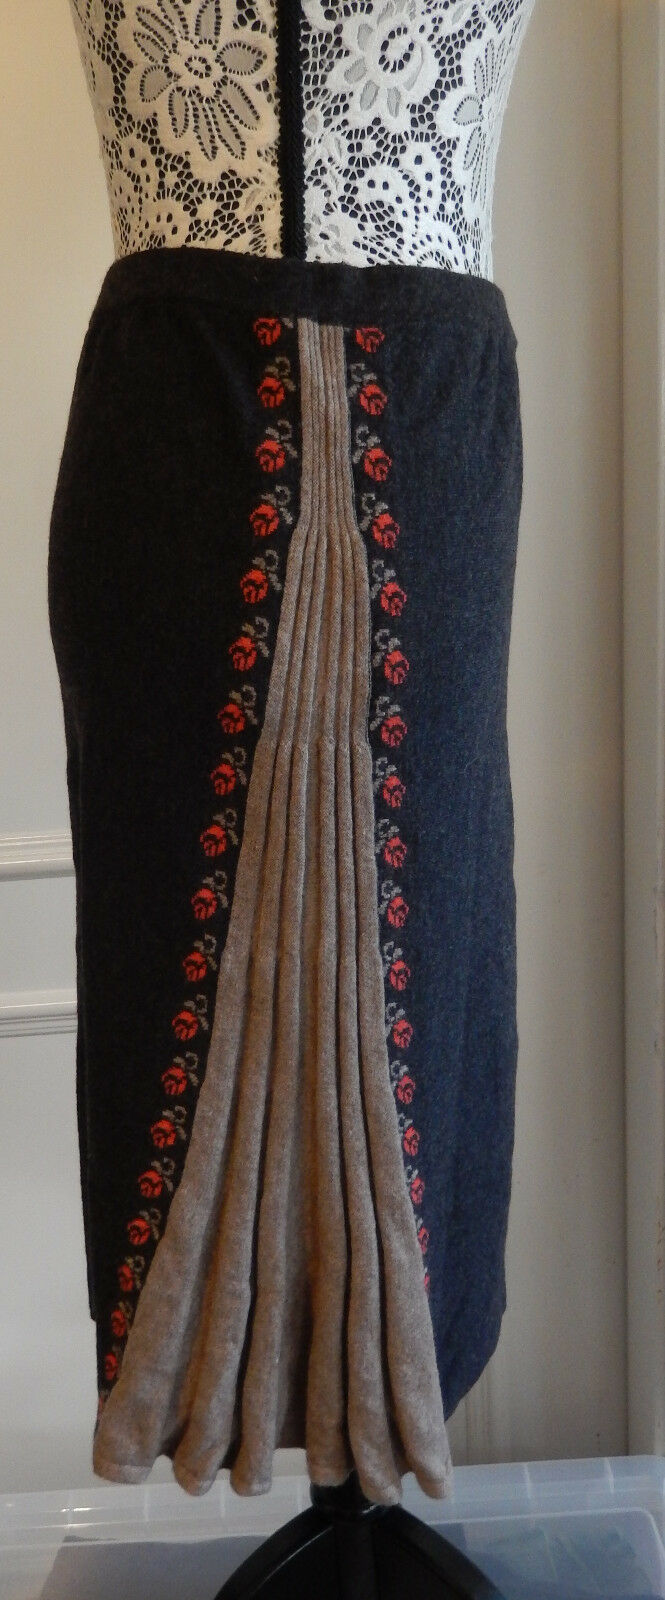 IVKO midi Rock Wolle Gr. 38 skirt wool Floral pattern